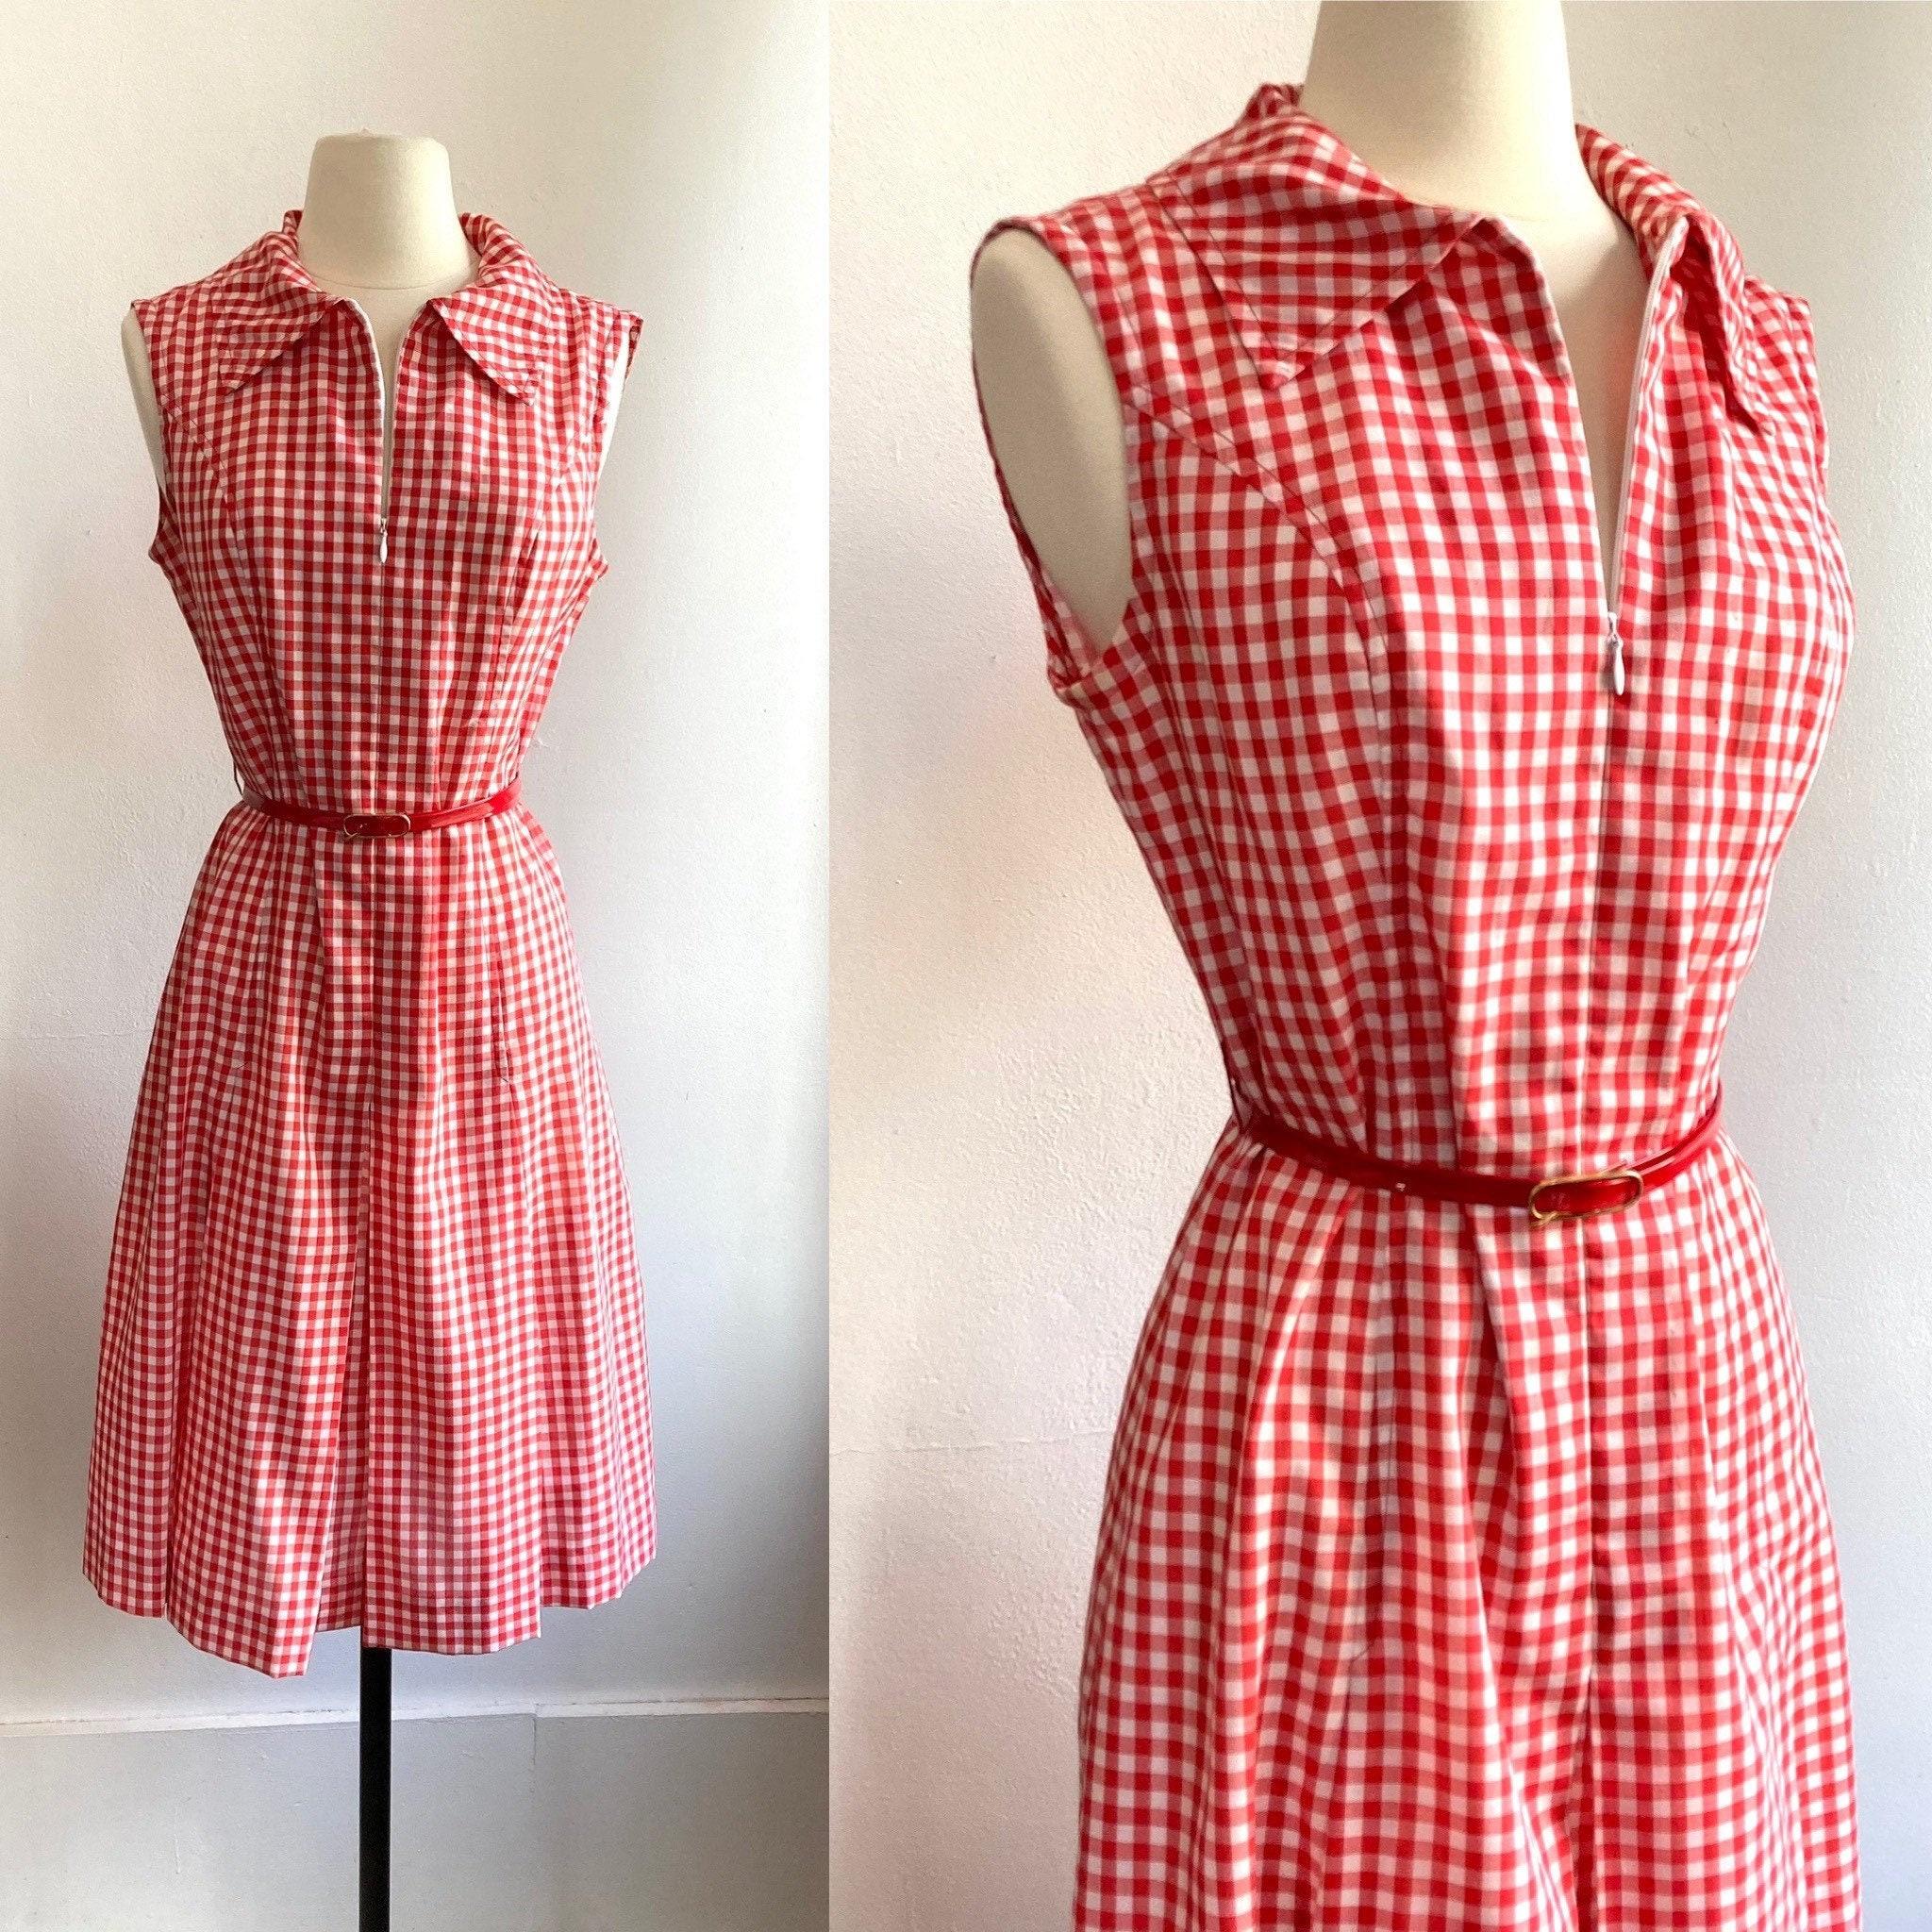 Vintage Scarf Styles -1920s to 1960s Vintage 60s Red Gingham House DressZip Front  Pleat Skirt Preppy $0.00 AT vintagedancer.com